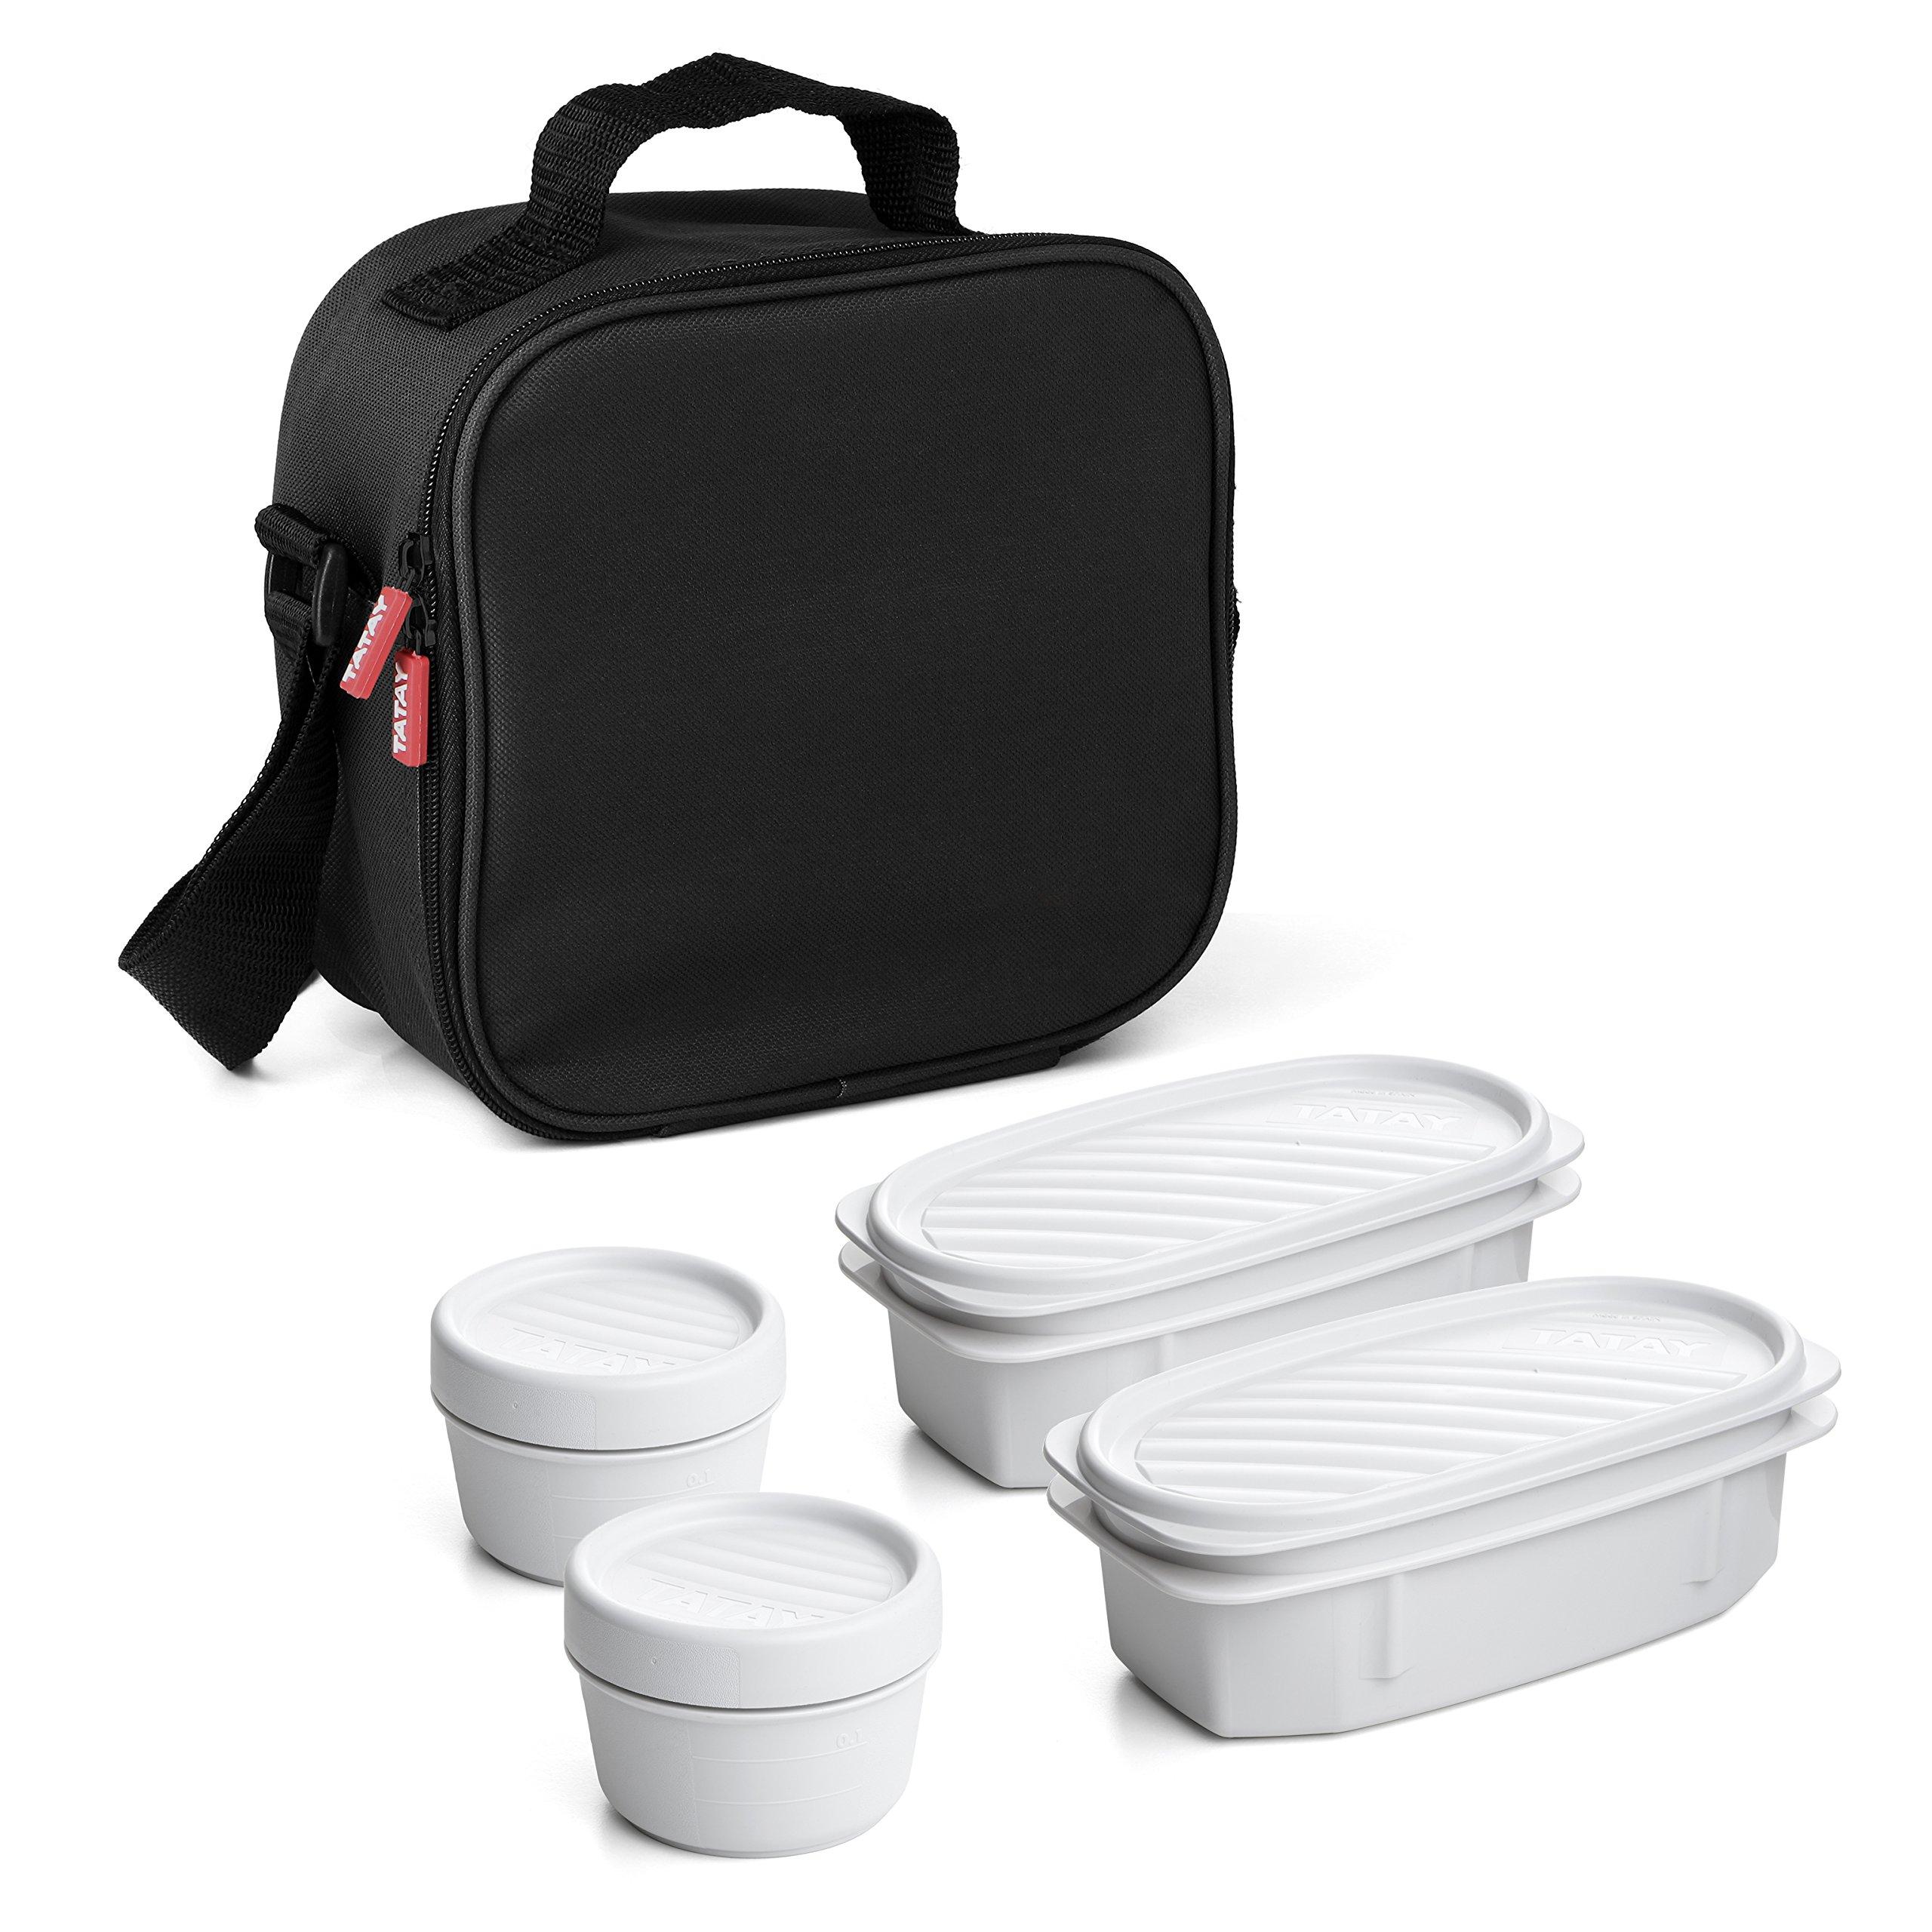 Tatay Urban Food Bolsa térmica Porta Alimentos con herméticos incluidos, Negro, 22.5 x 10